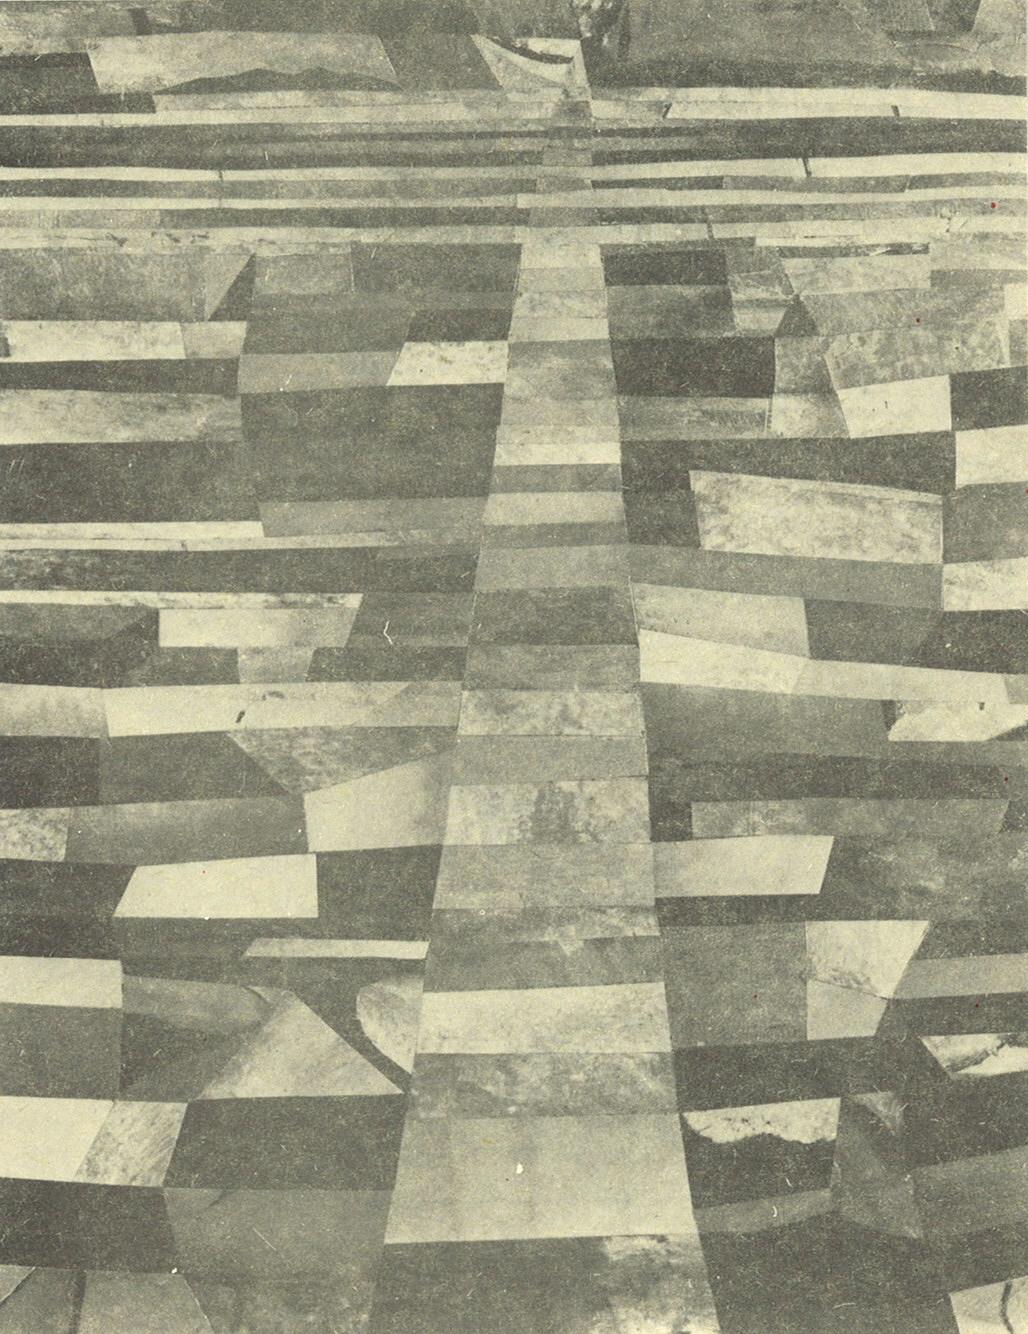 Poslijepodne na putu za Emaus (hommage a Paul Klee et Amadeo Modigliani) (collage, 30.12.1986.)